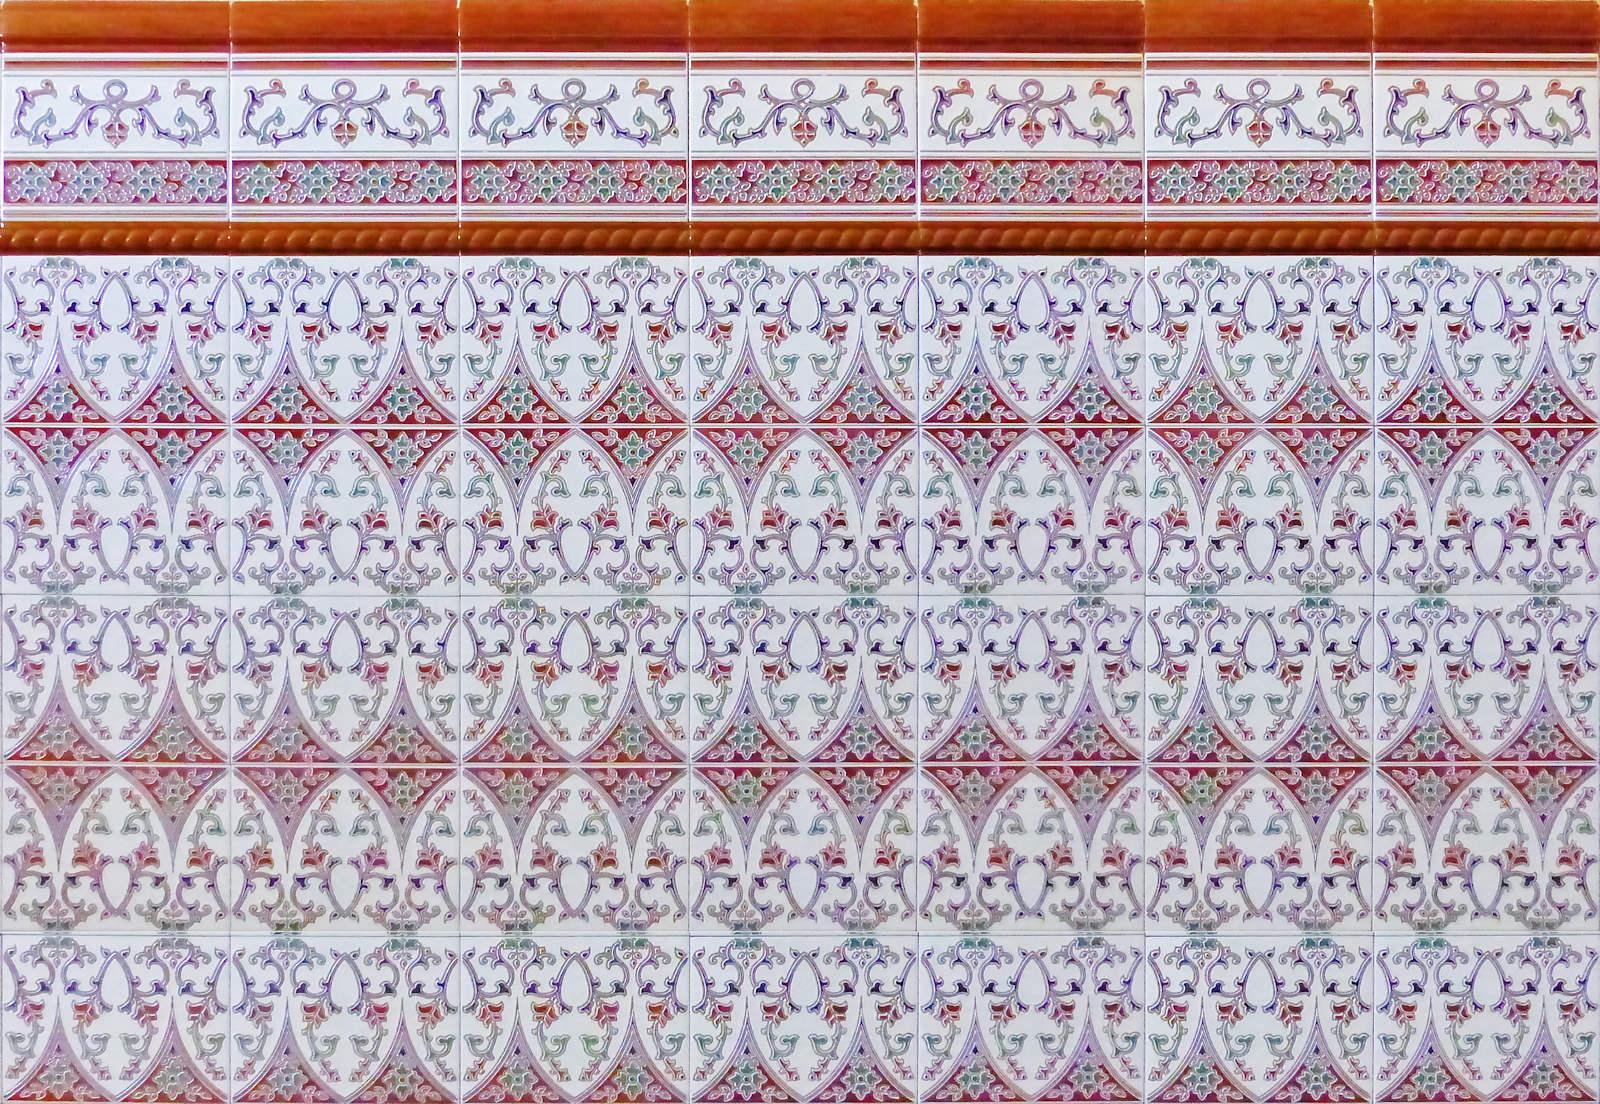 Mosquée As-Salam Tourcoing - Motifs, arabesques